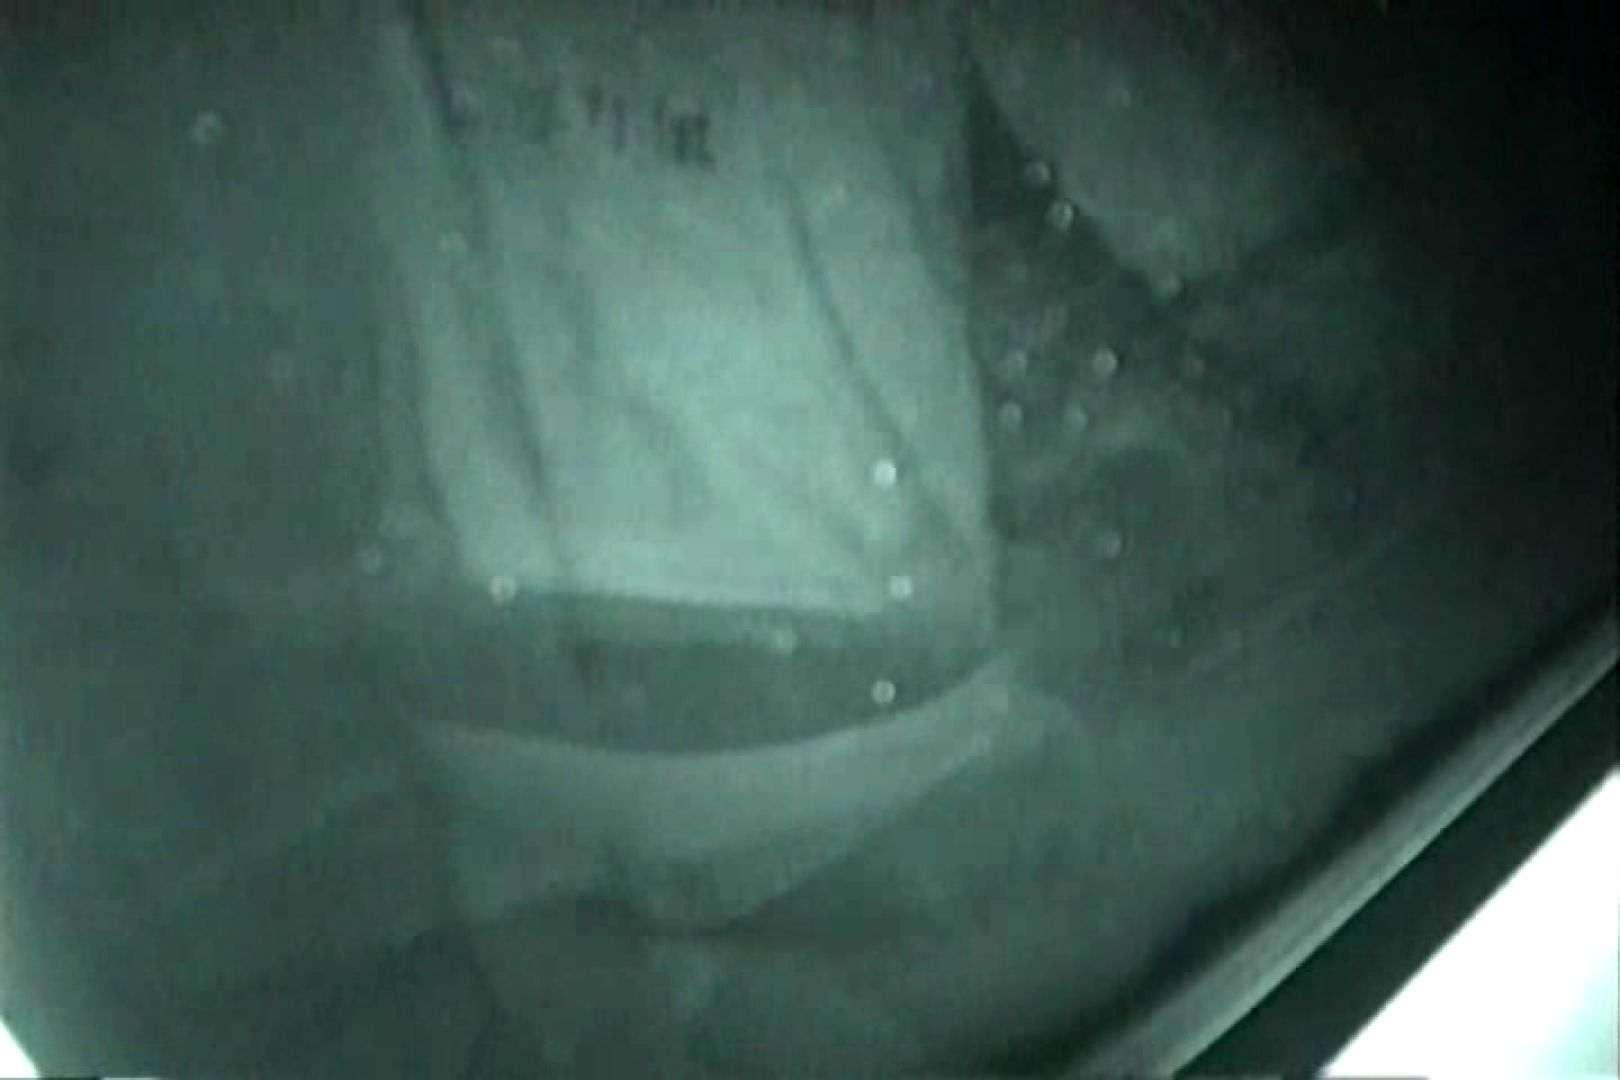 充血監督の深夜の運動会Vol.124 赤外線 盗撮オマンコ無修正動画無料 63画像 53